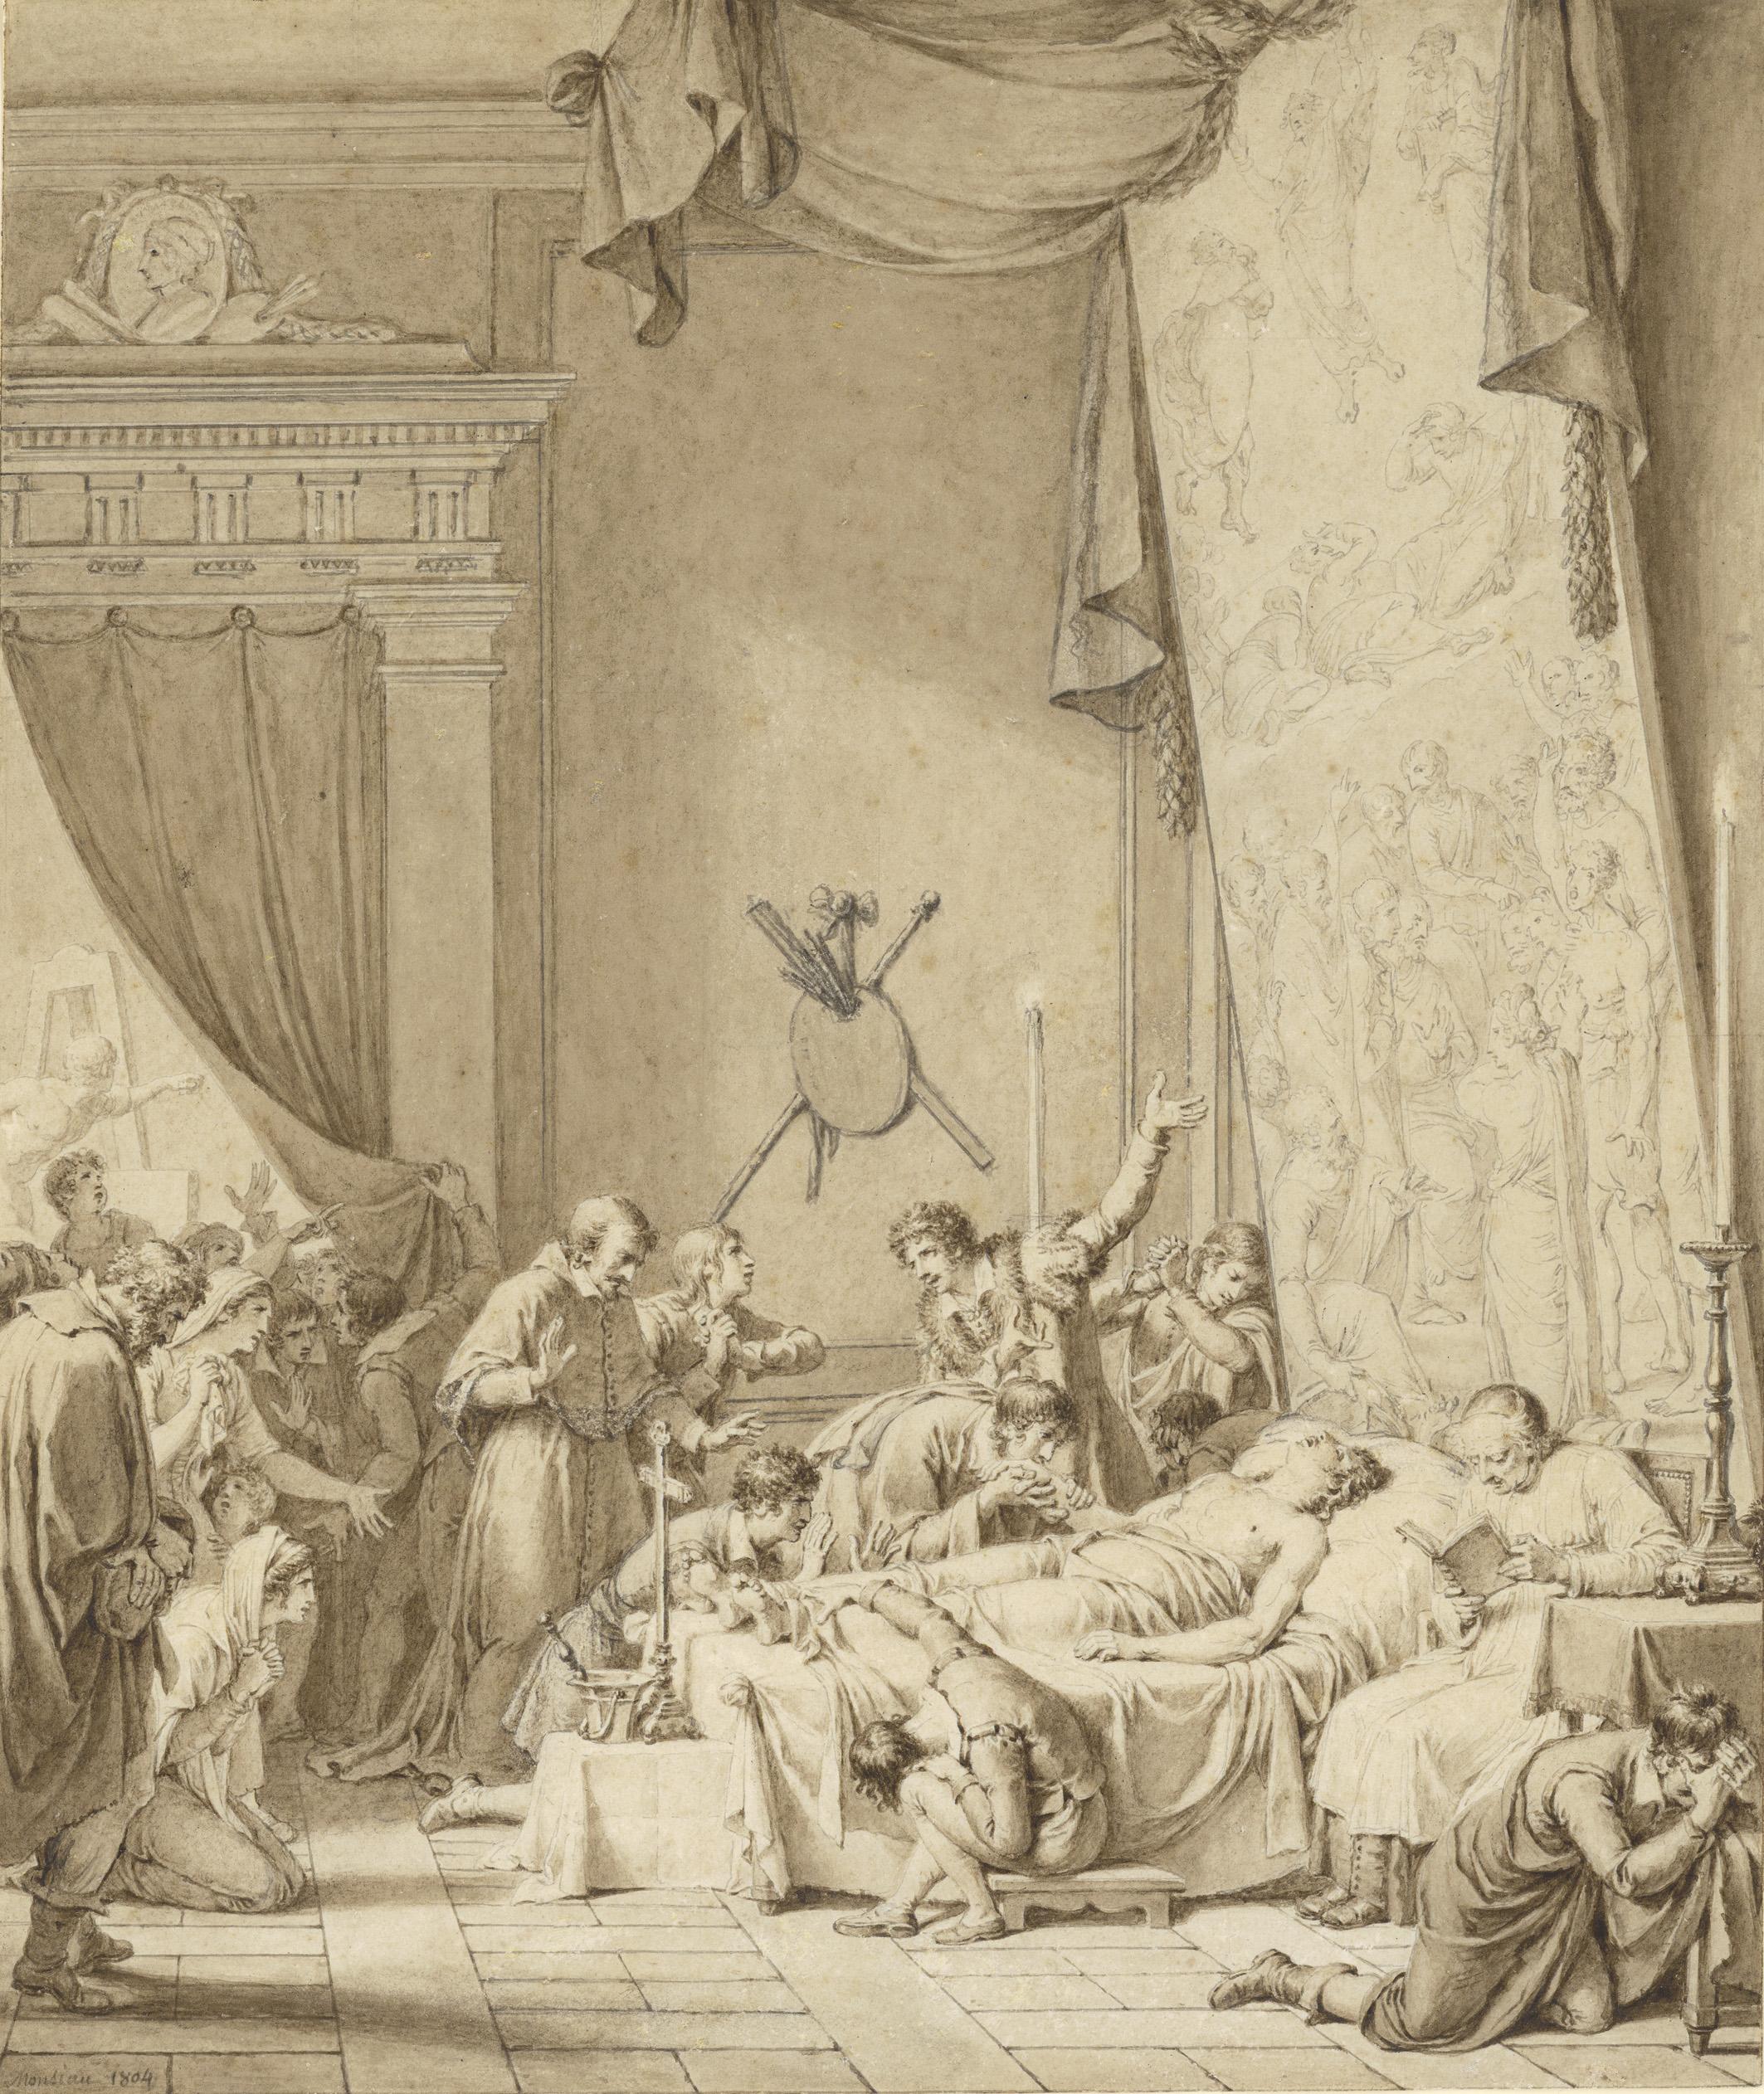 Nicolas-André Monsiau (1754–1837) Der Tod Raffaels, 1804 Feder in Braun über Bleistift, hellbraun laviert, auf beigem Papier, 322 x 272 mm © Hamburger Kunsthalle / bpk Foto: Christoph Irrgang